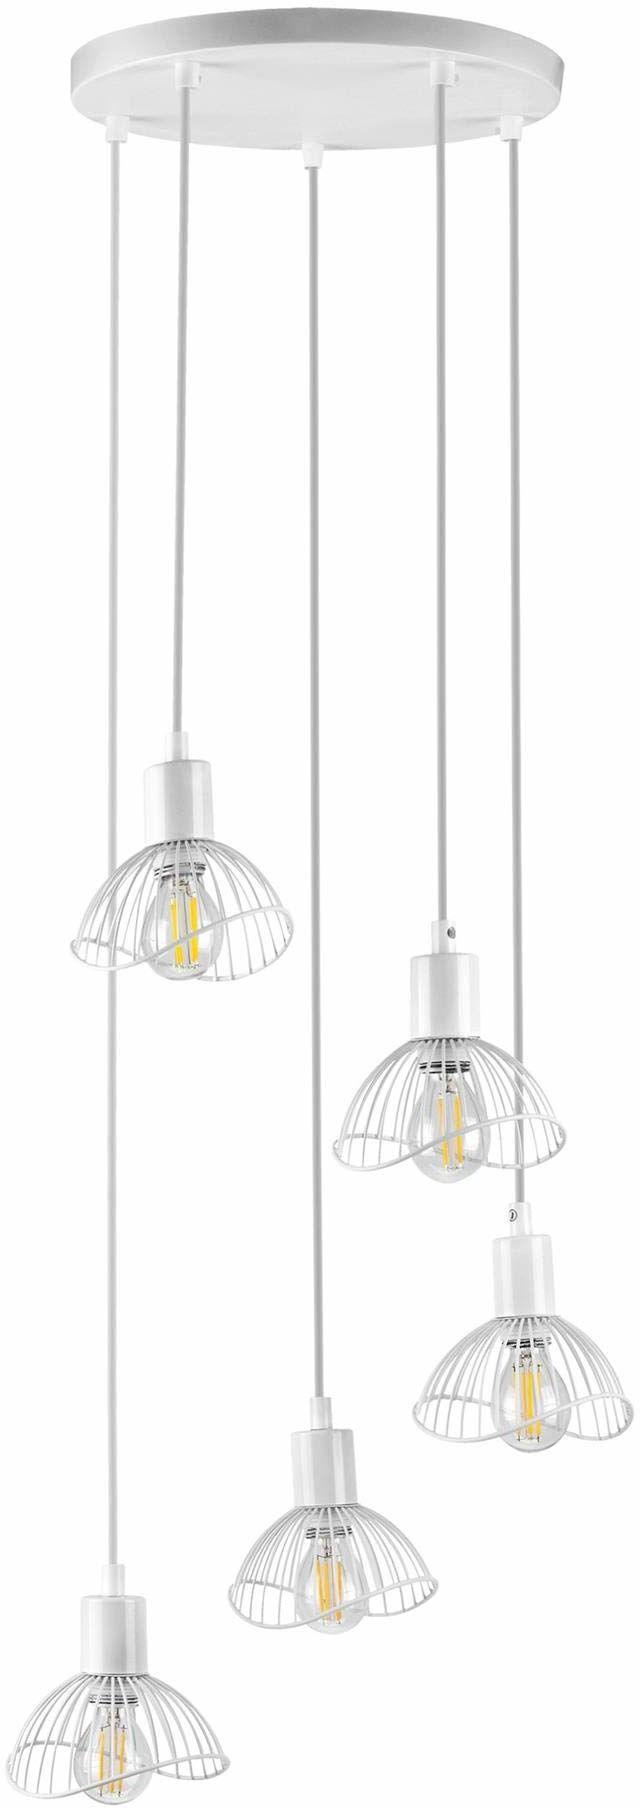 Activejet Aje-Holly 8 Whi Lampa ,Biały ,5 Żarówek